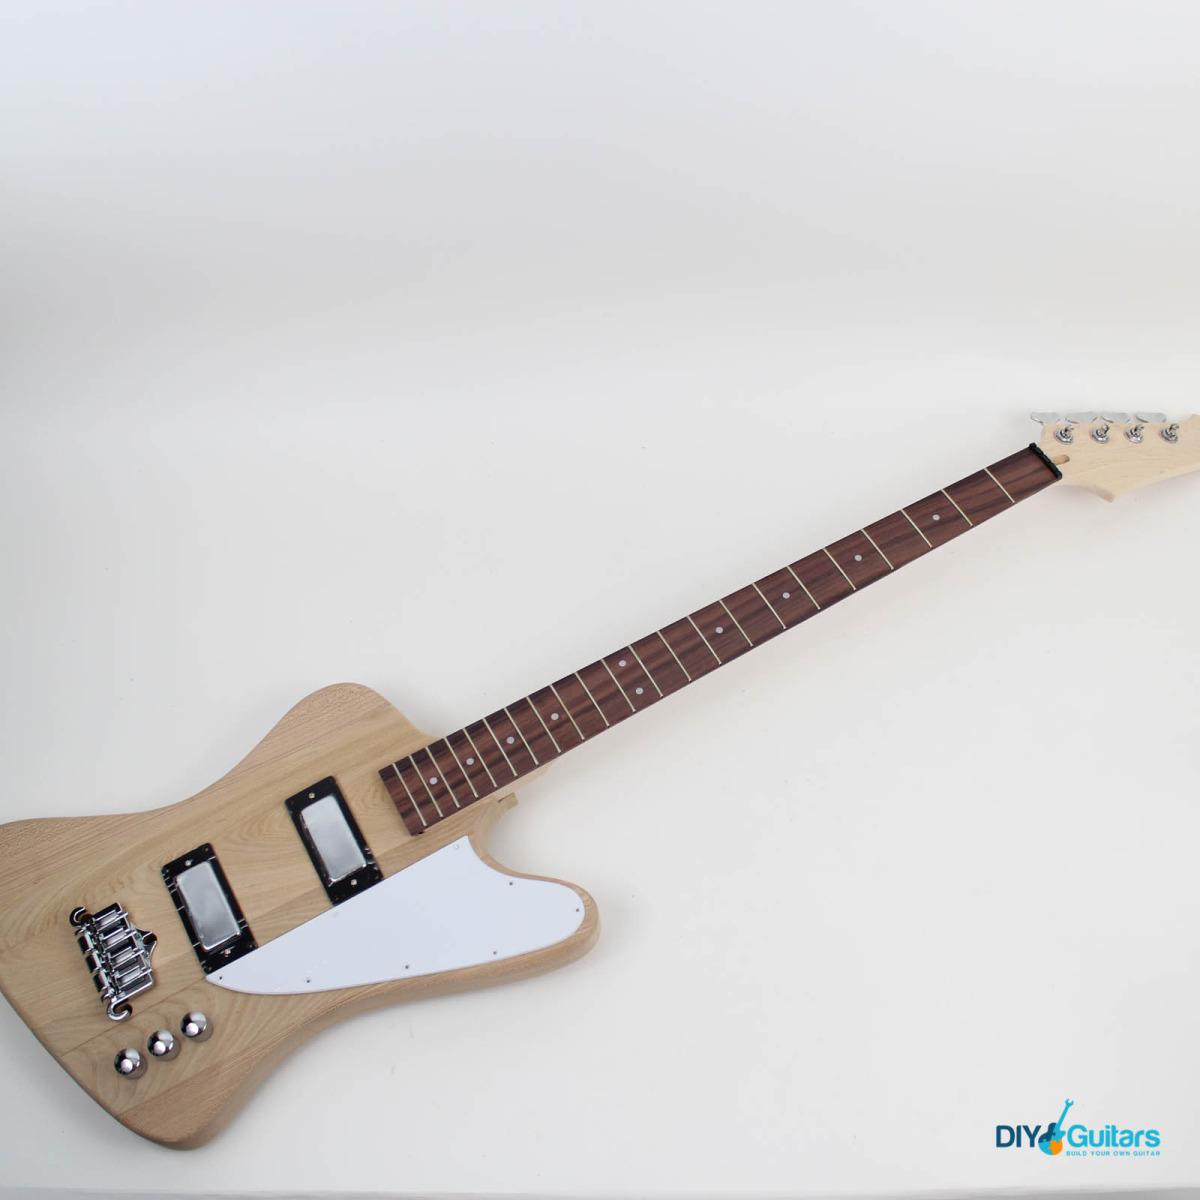 Gibson thunderbird style bass guitar kit diy guitars gibson thunderbird style bass guitar kit solutioingenieria Choice Image